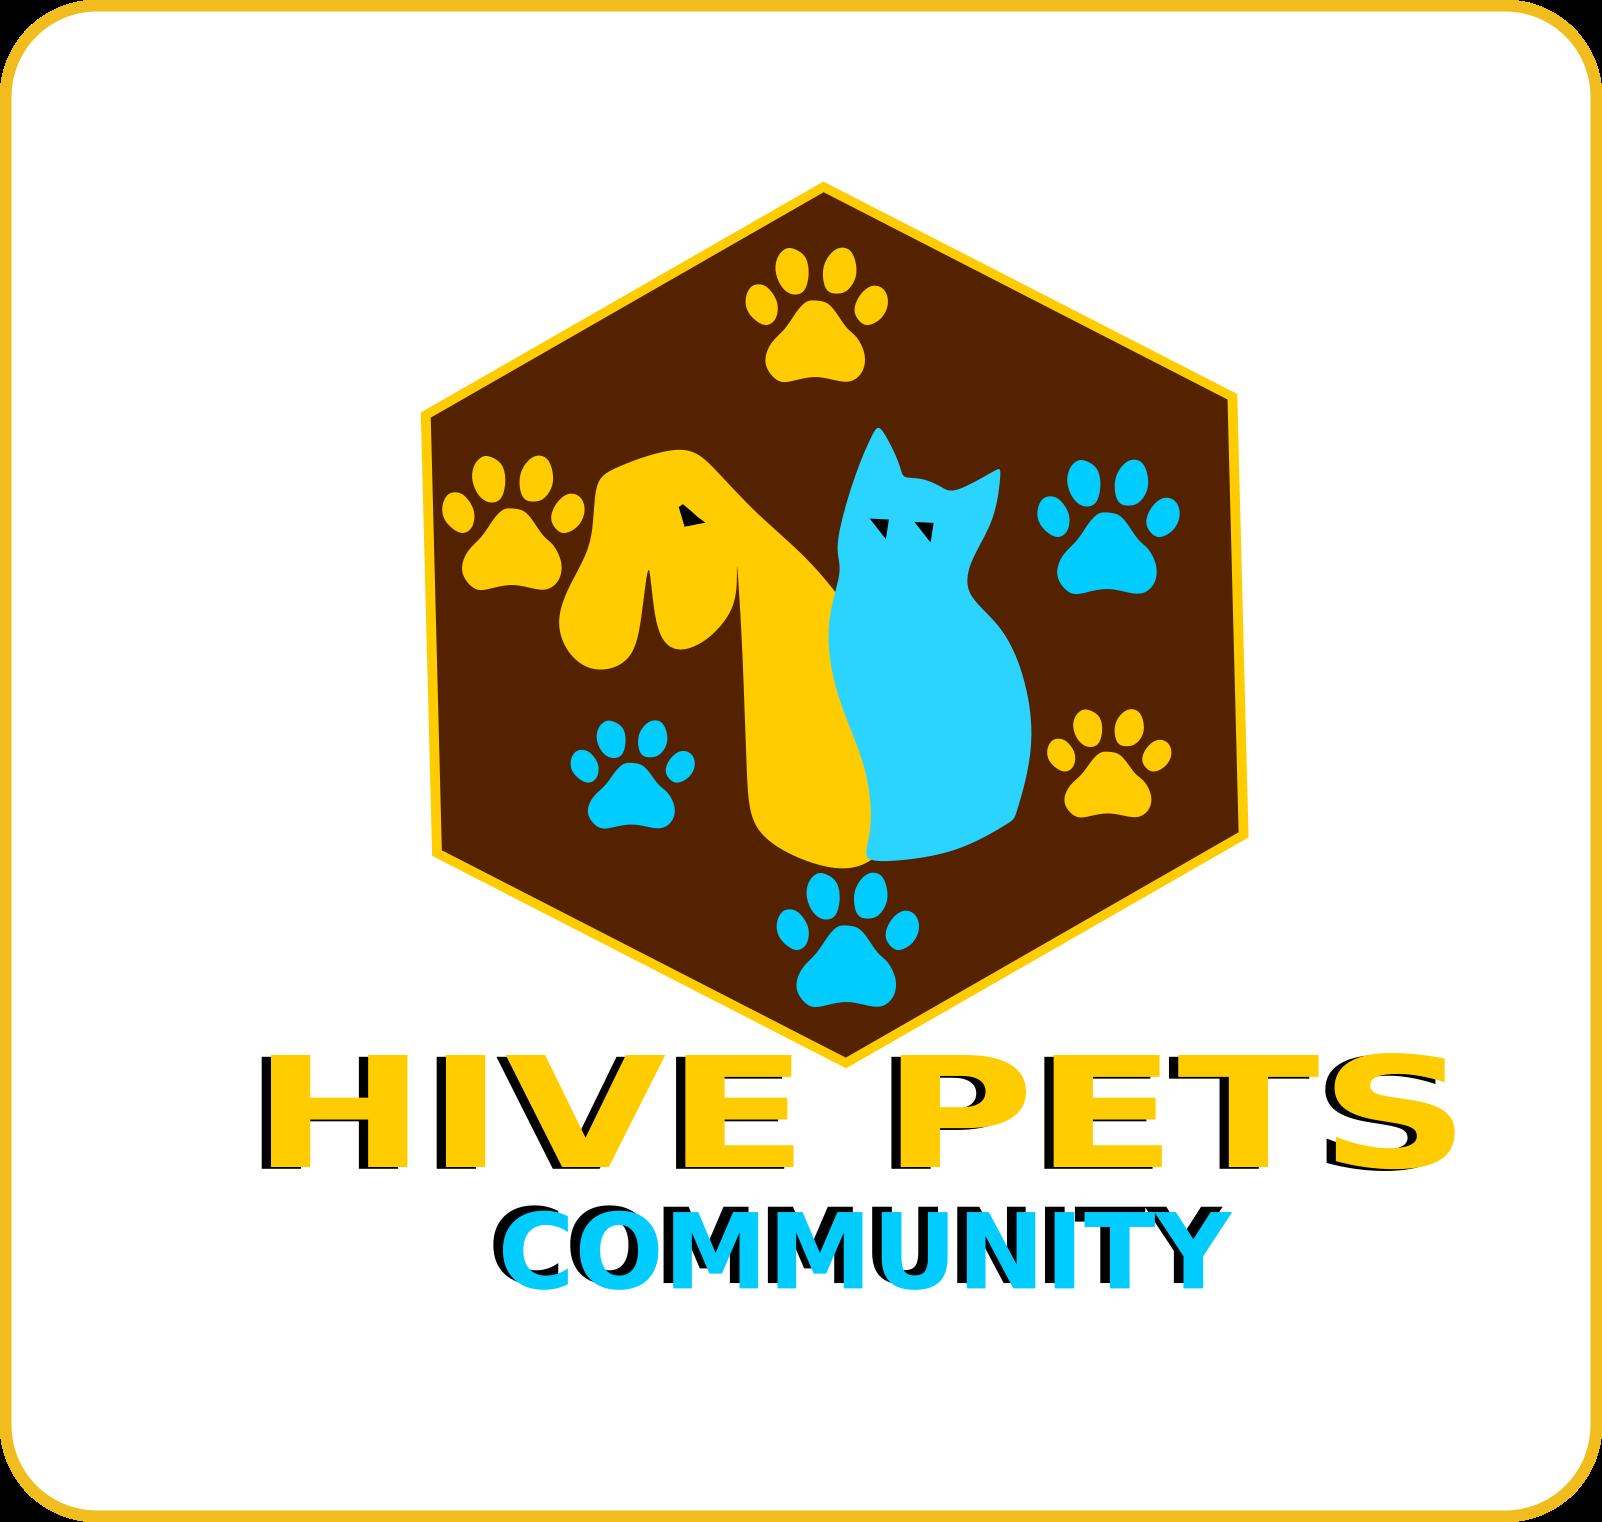 logo-hive-pets.png